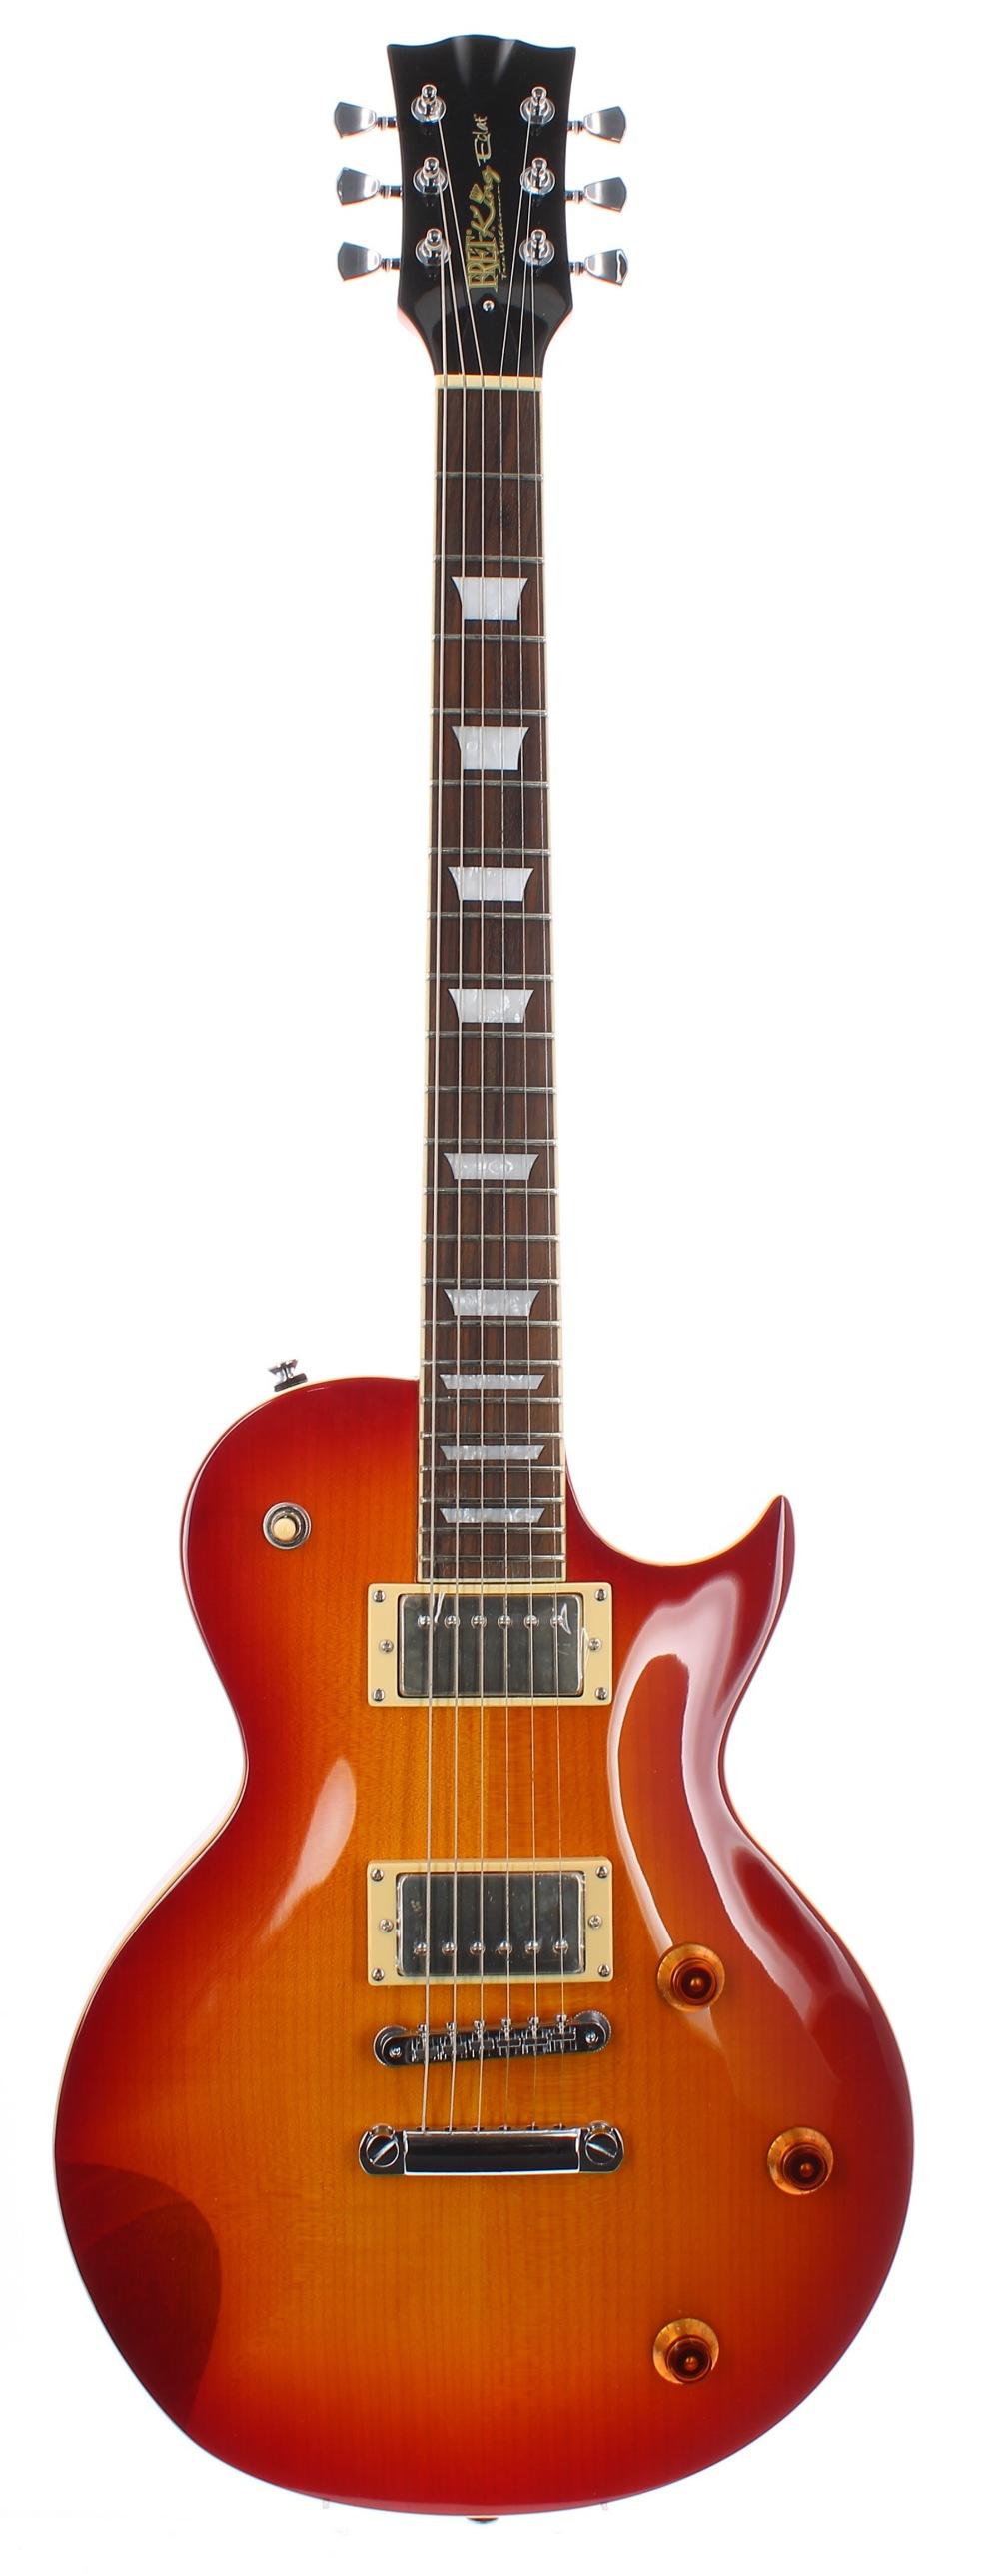 Fretking Black Label Eclat Standard electric guitar; Finish: cherry sunburst; Fretboard: rosewood;